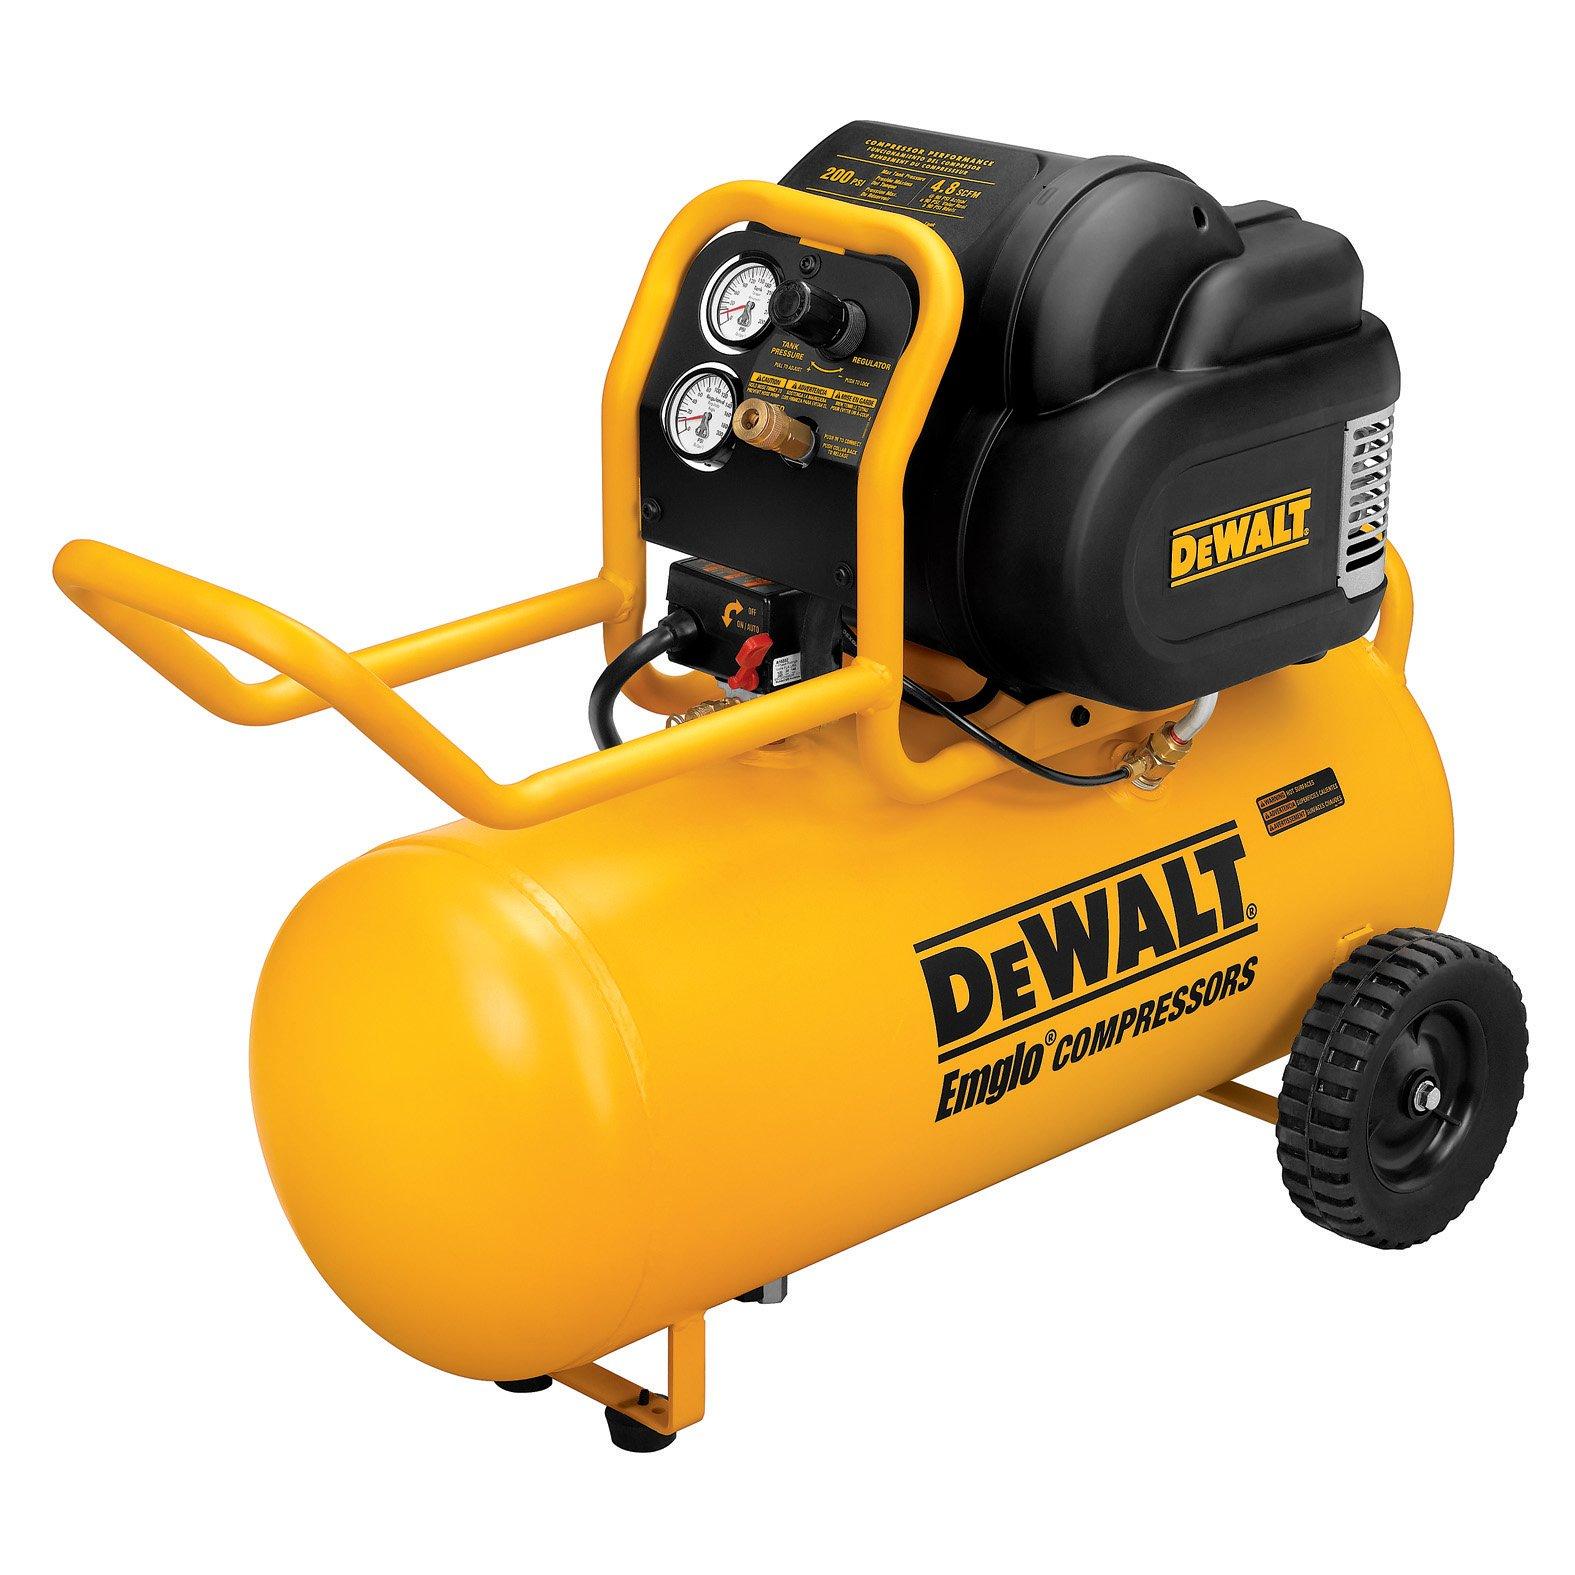 DEWALT D55167 1.6 HP 200 PSI Oil Free High Pressure Low Noise Horizontal Portable Compressor